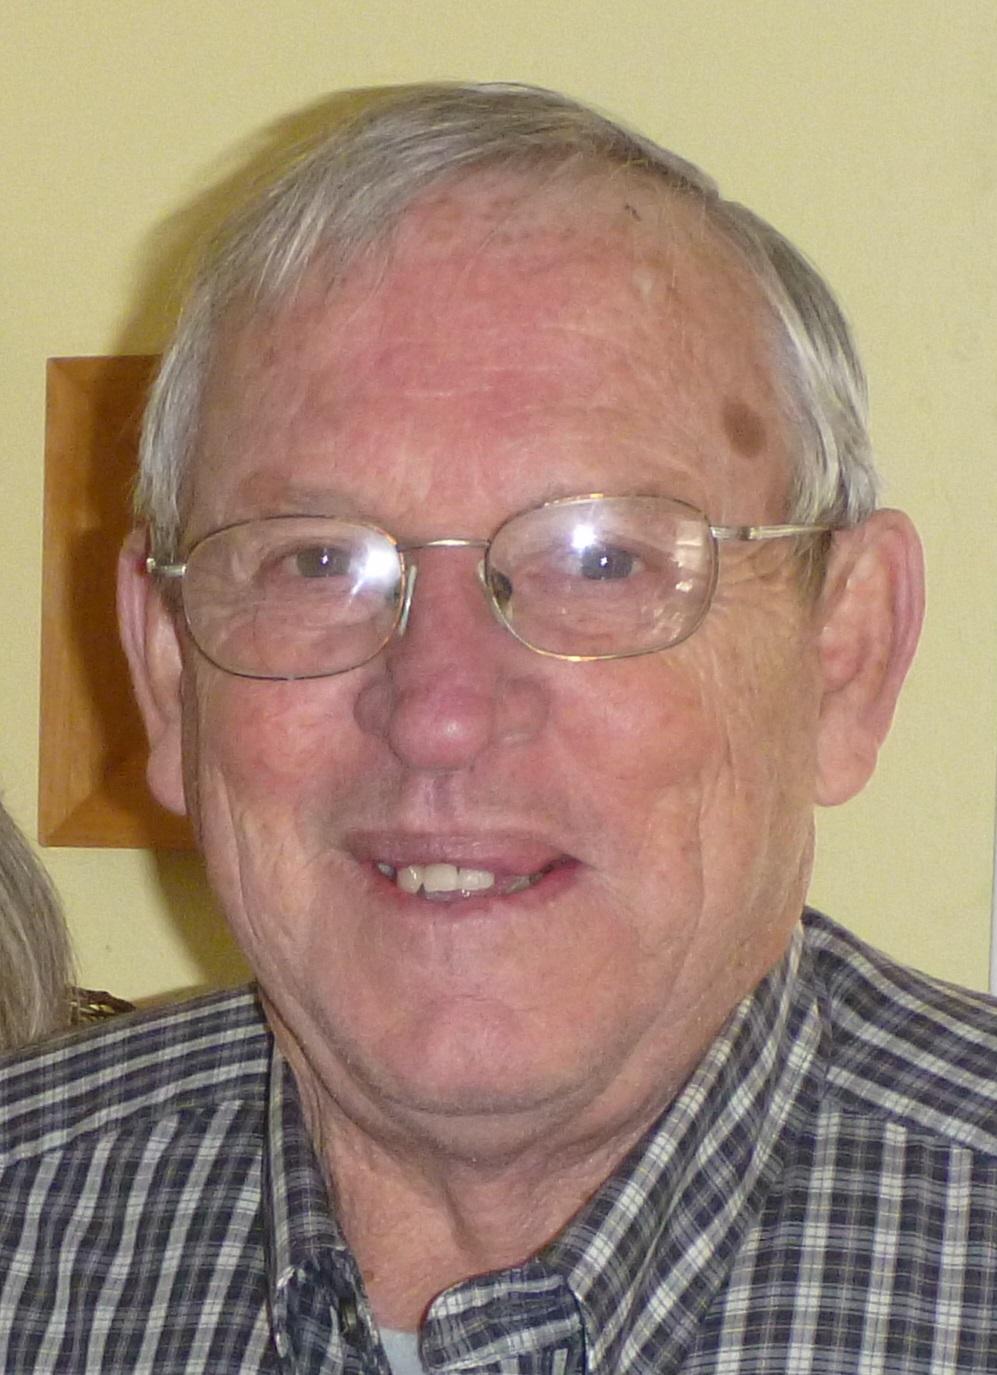 LeRoy Gottfried Becker, 82, Scottsbluff, formerly of Bayard